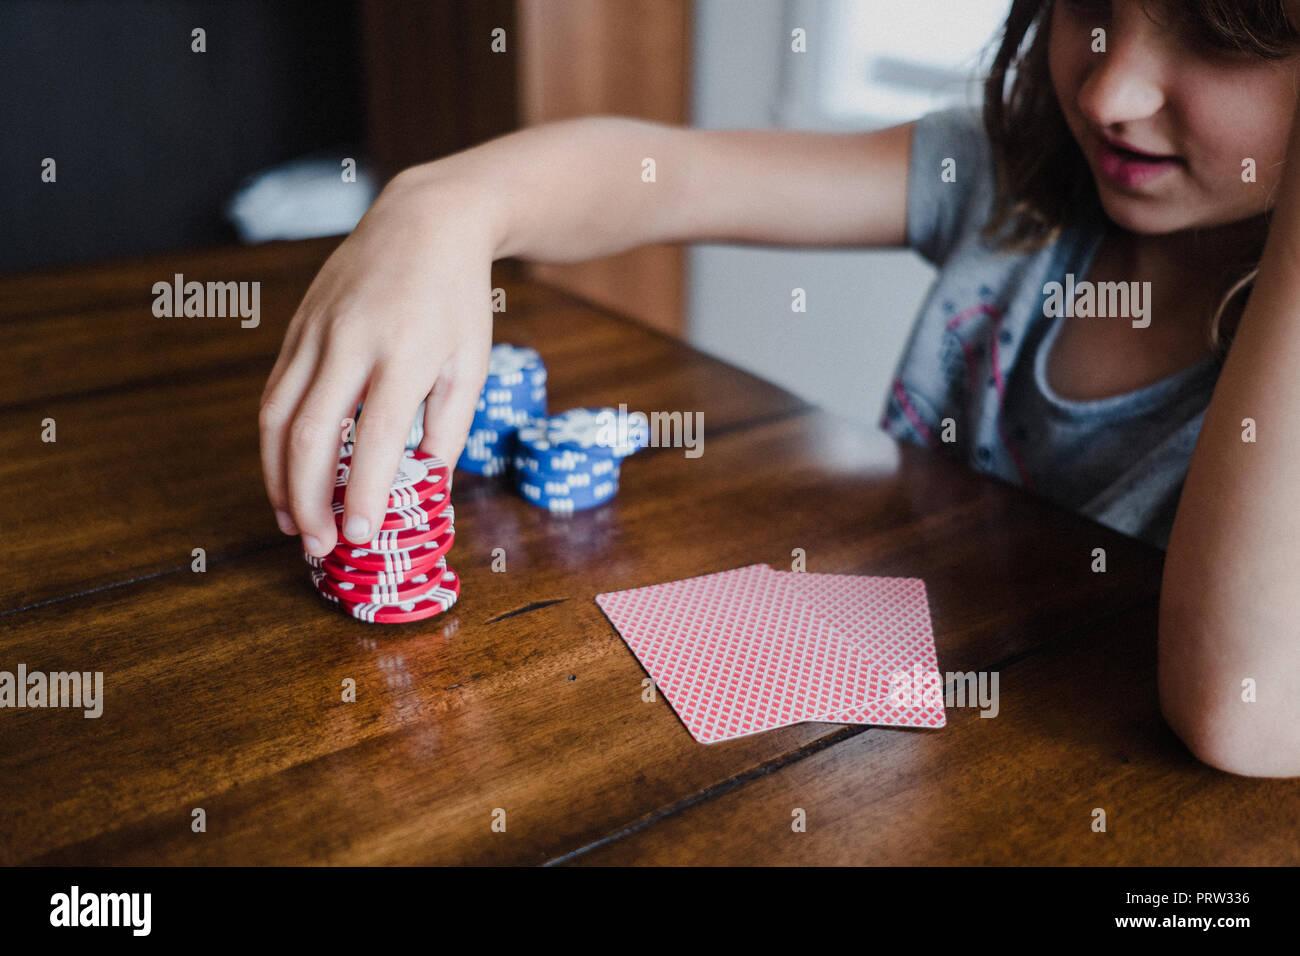 Girl playing cards at table, stacking gambling chips, close up - Stock Image